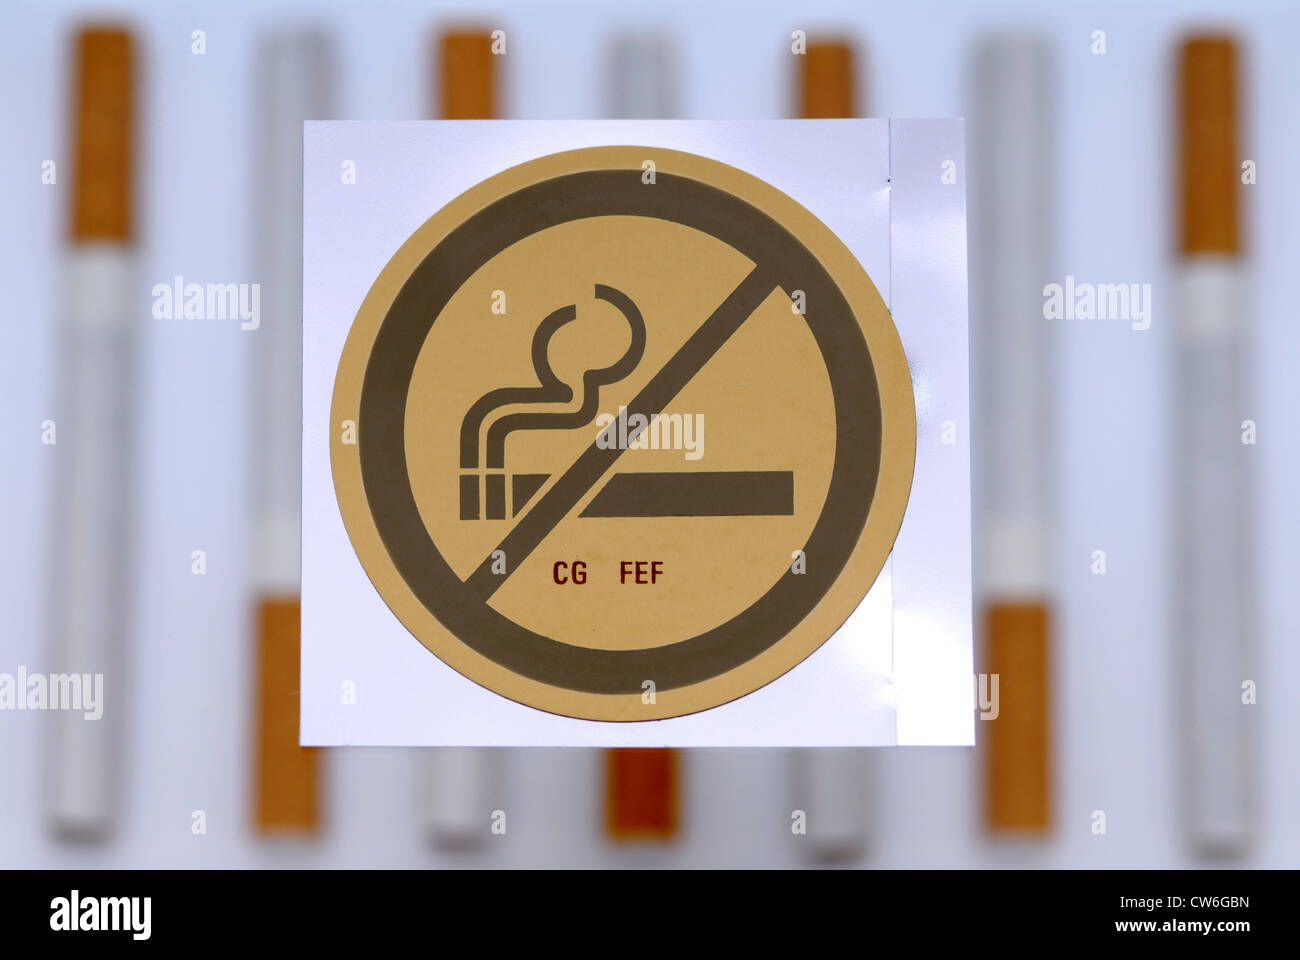 nicotine patch - Stock Image